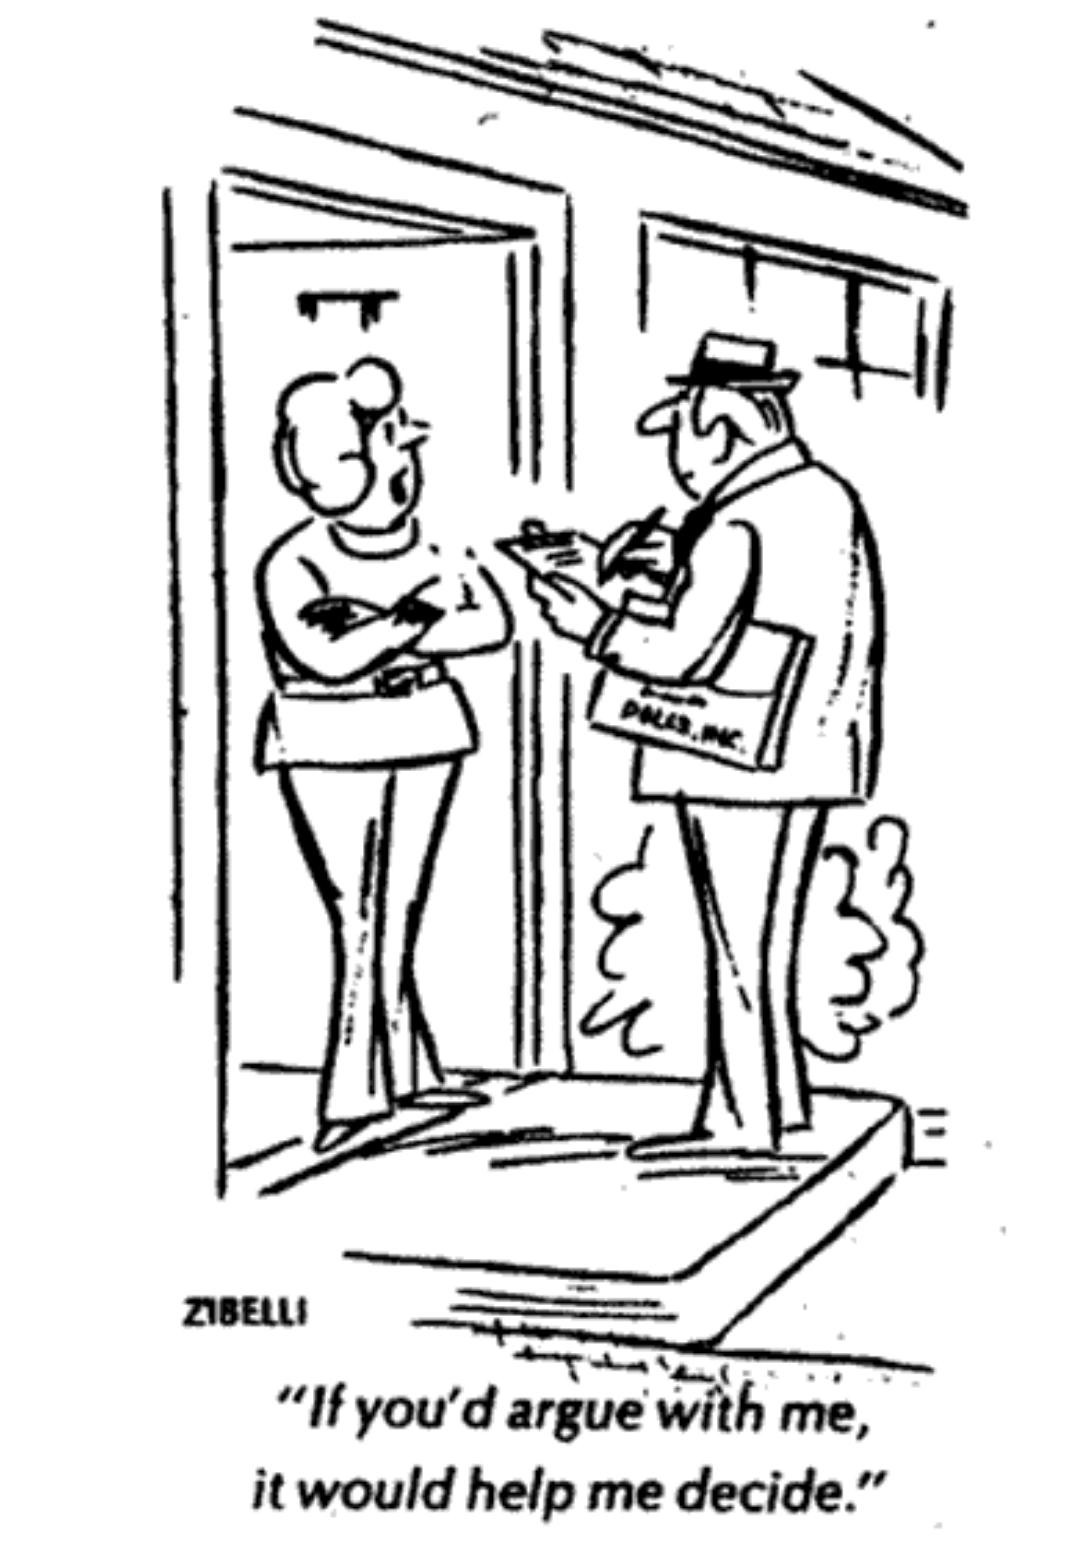 Cartoon - Zibelli - If you'd argue with me, it would help me decide.